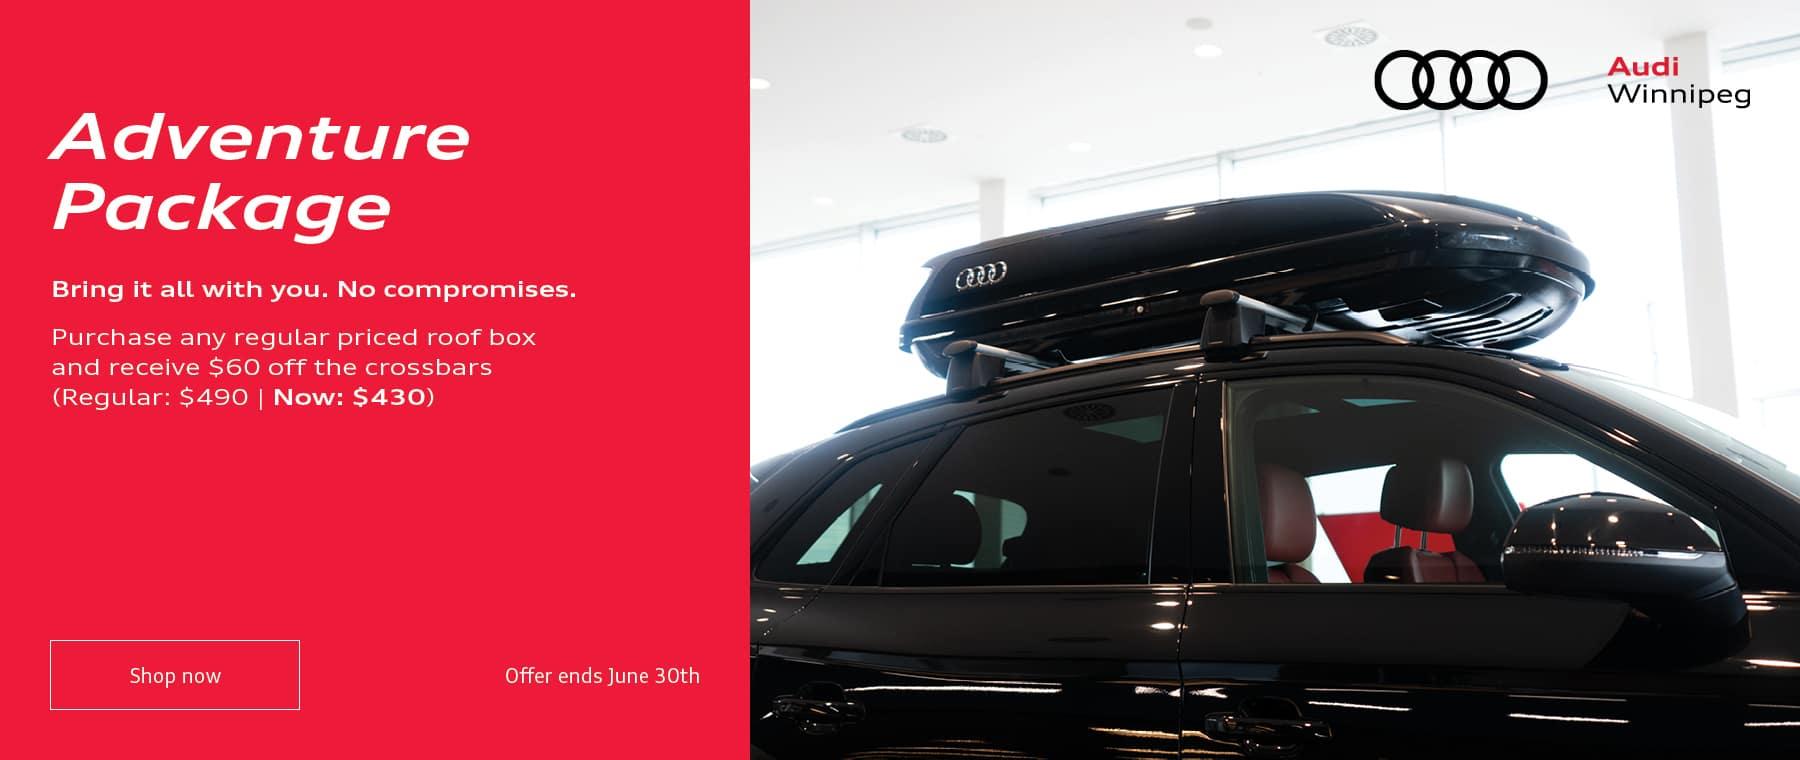 Audi-Wpg-Adventure-Package – Web-Banner